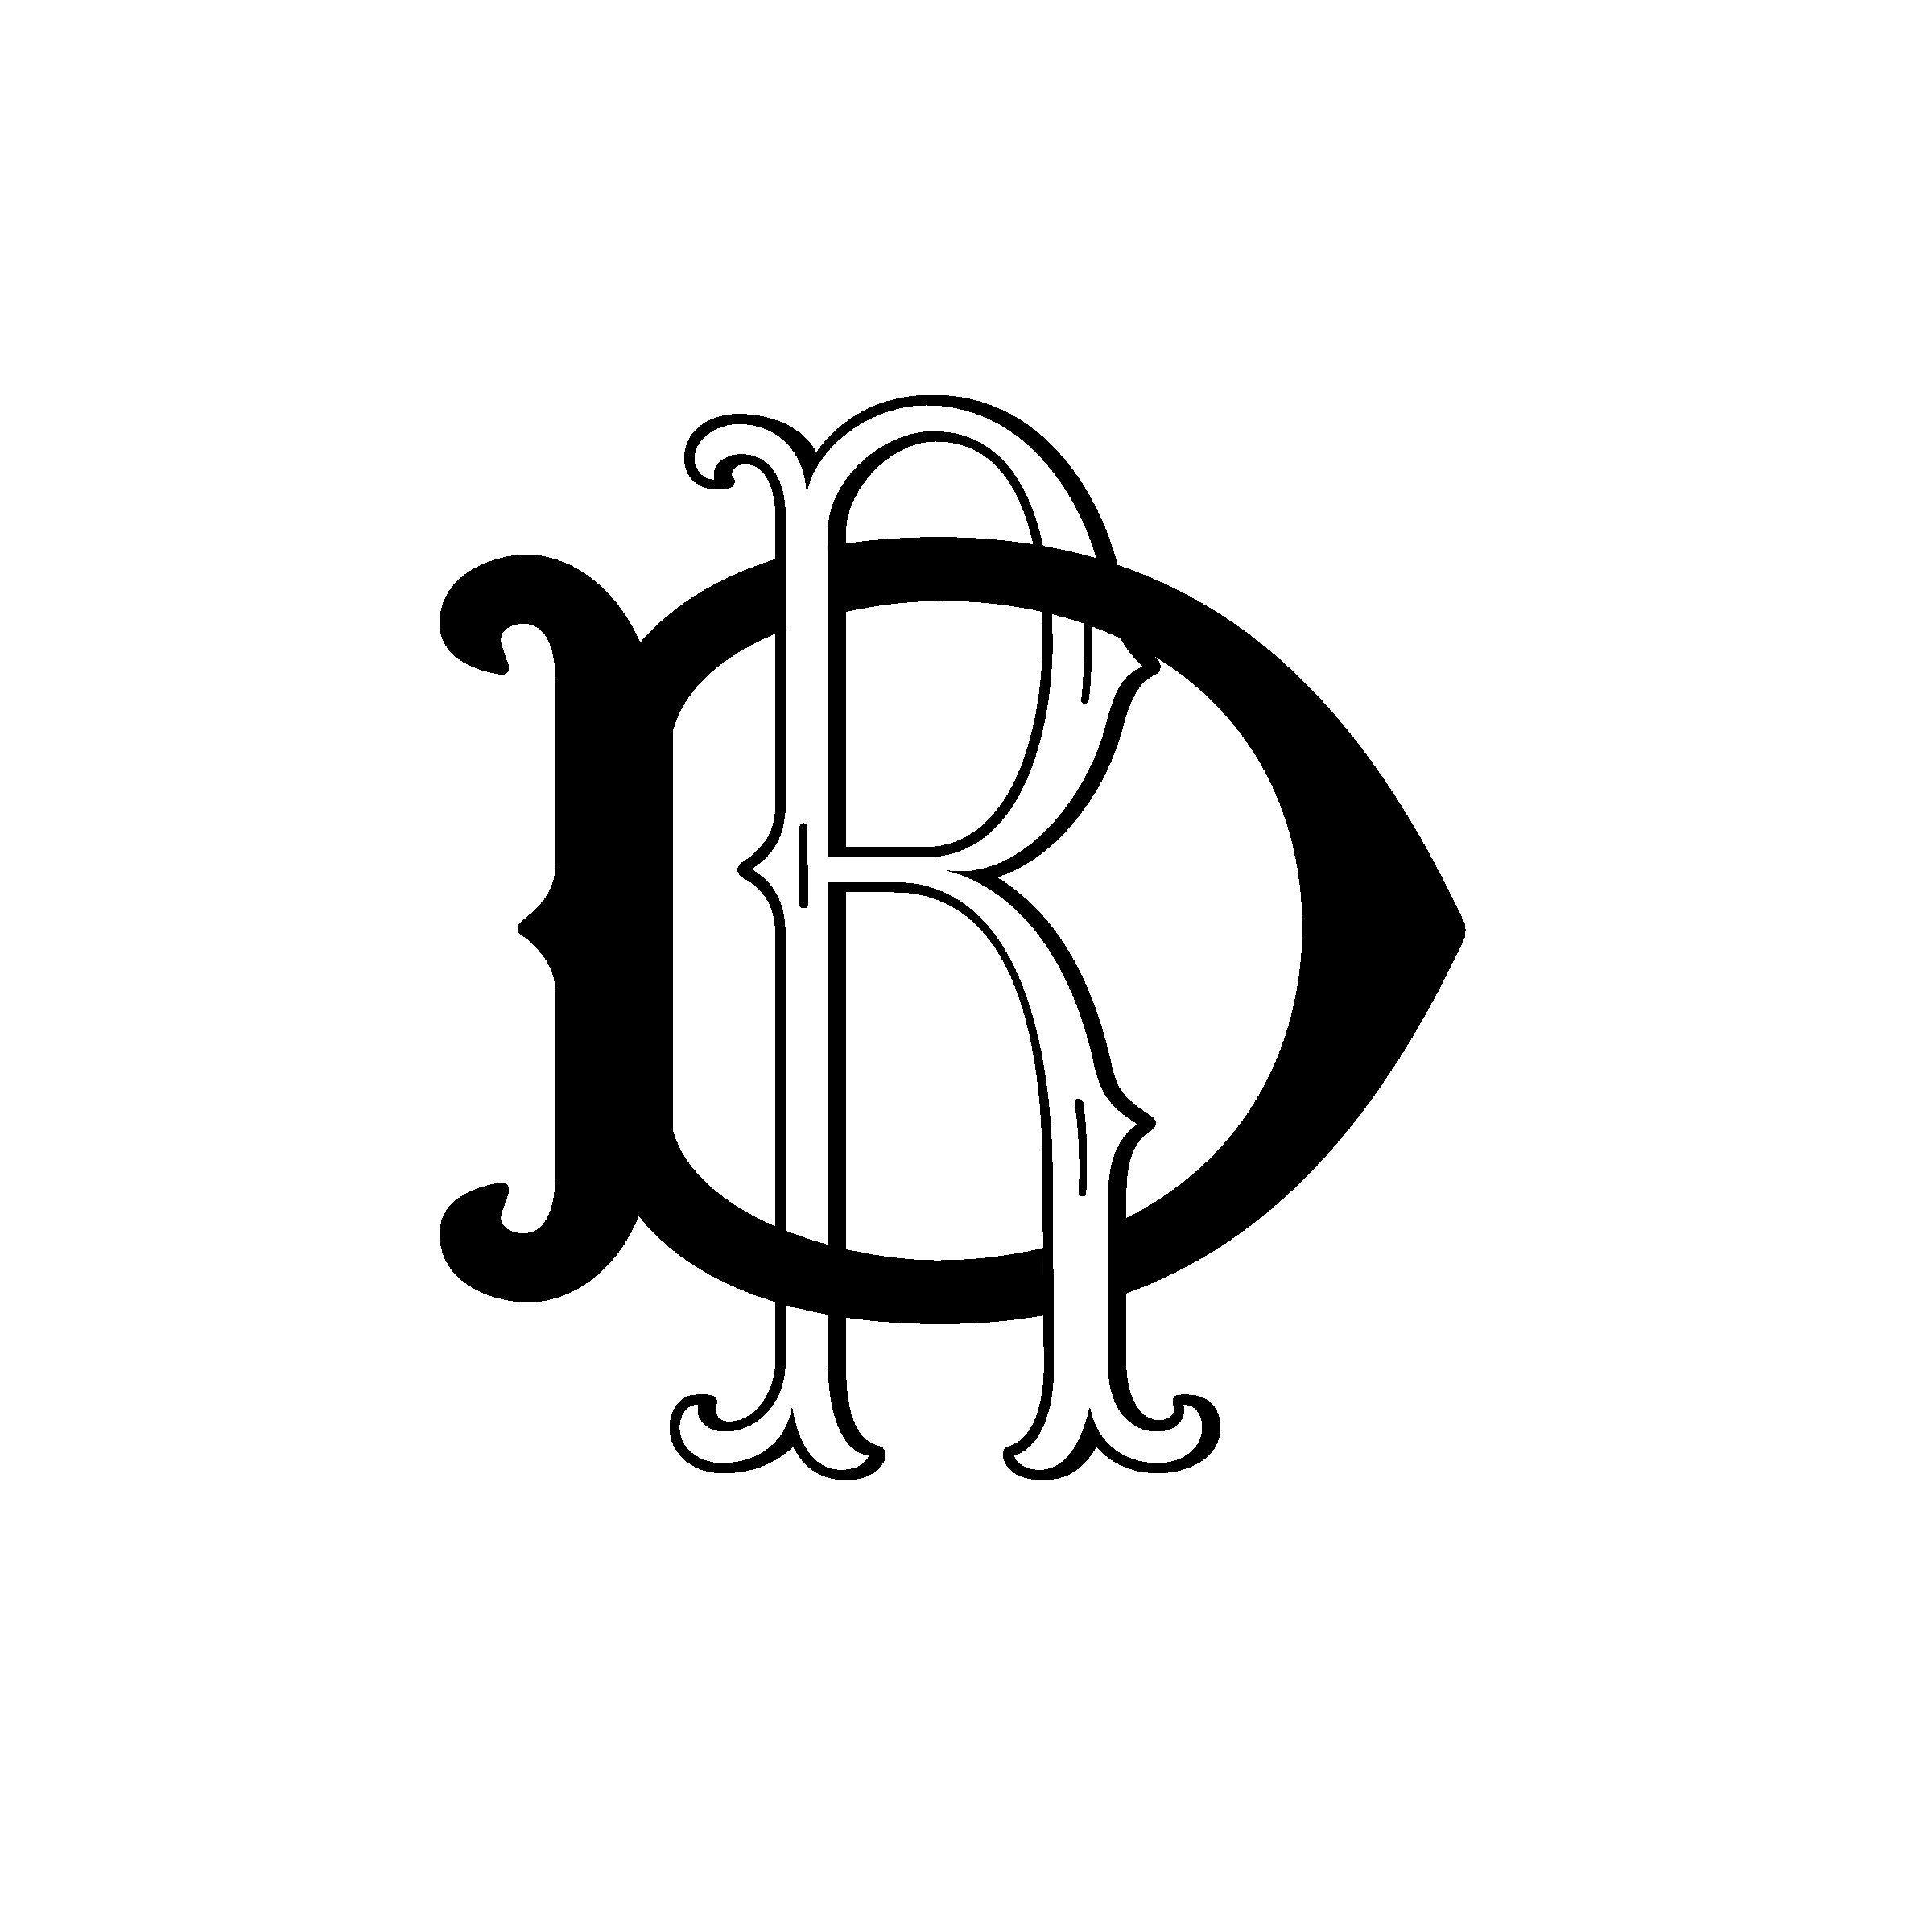 vintage digital wedding monogram 49 wedding logo custom wedding rh pinterest com bridal shower logo free Wedding Shower Clip Art